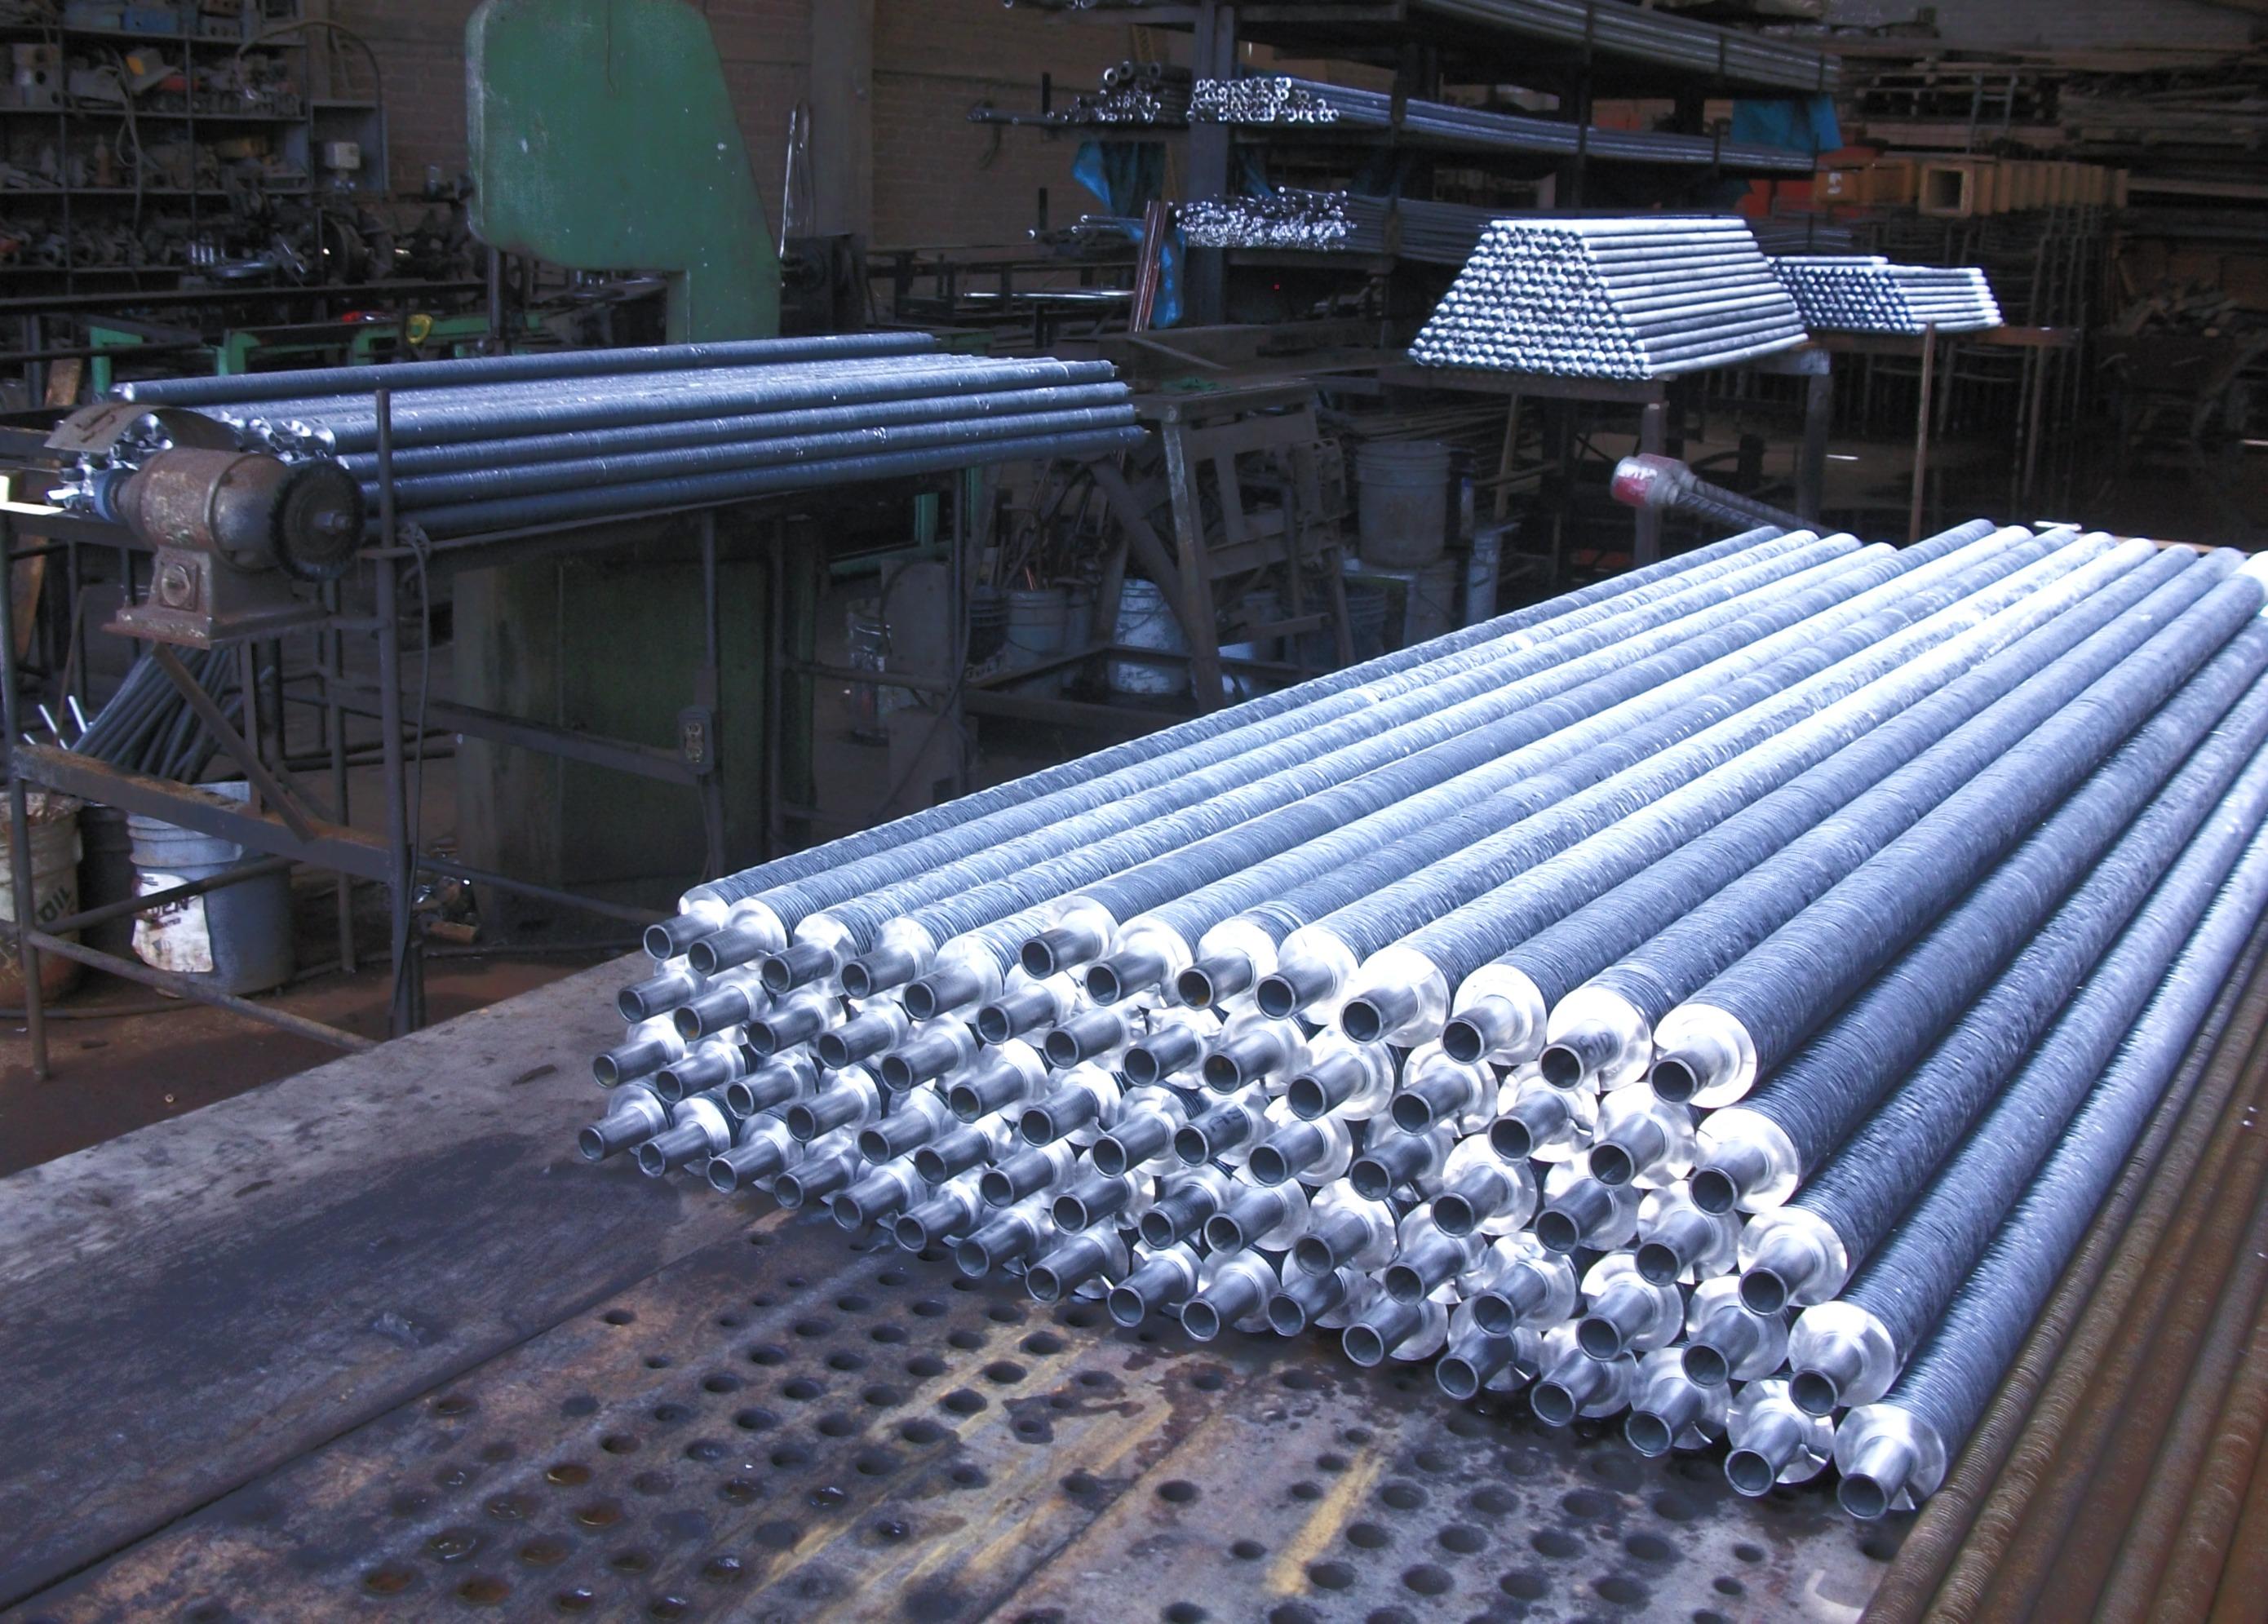 tubos aletados